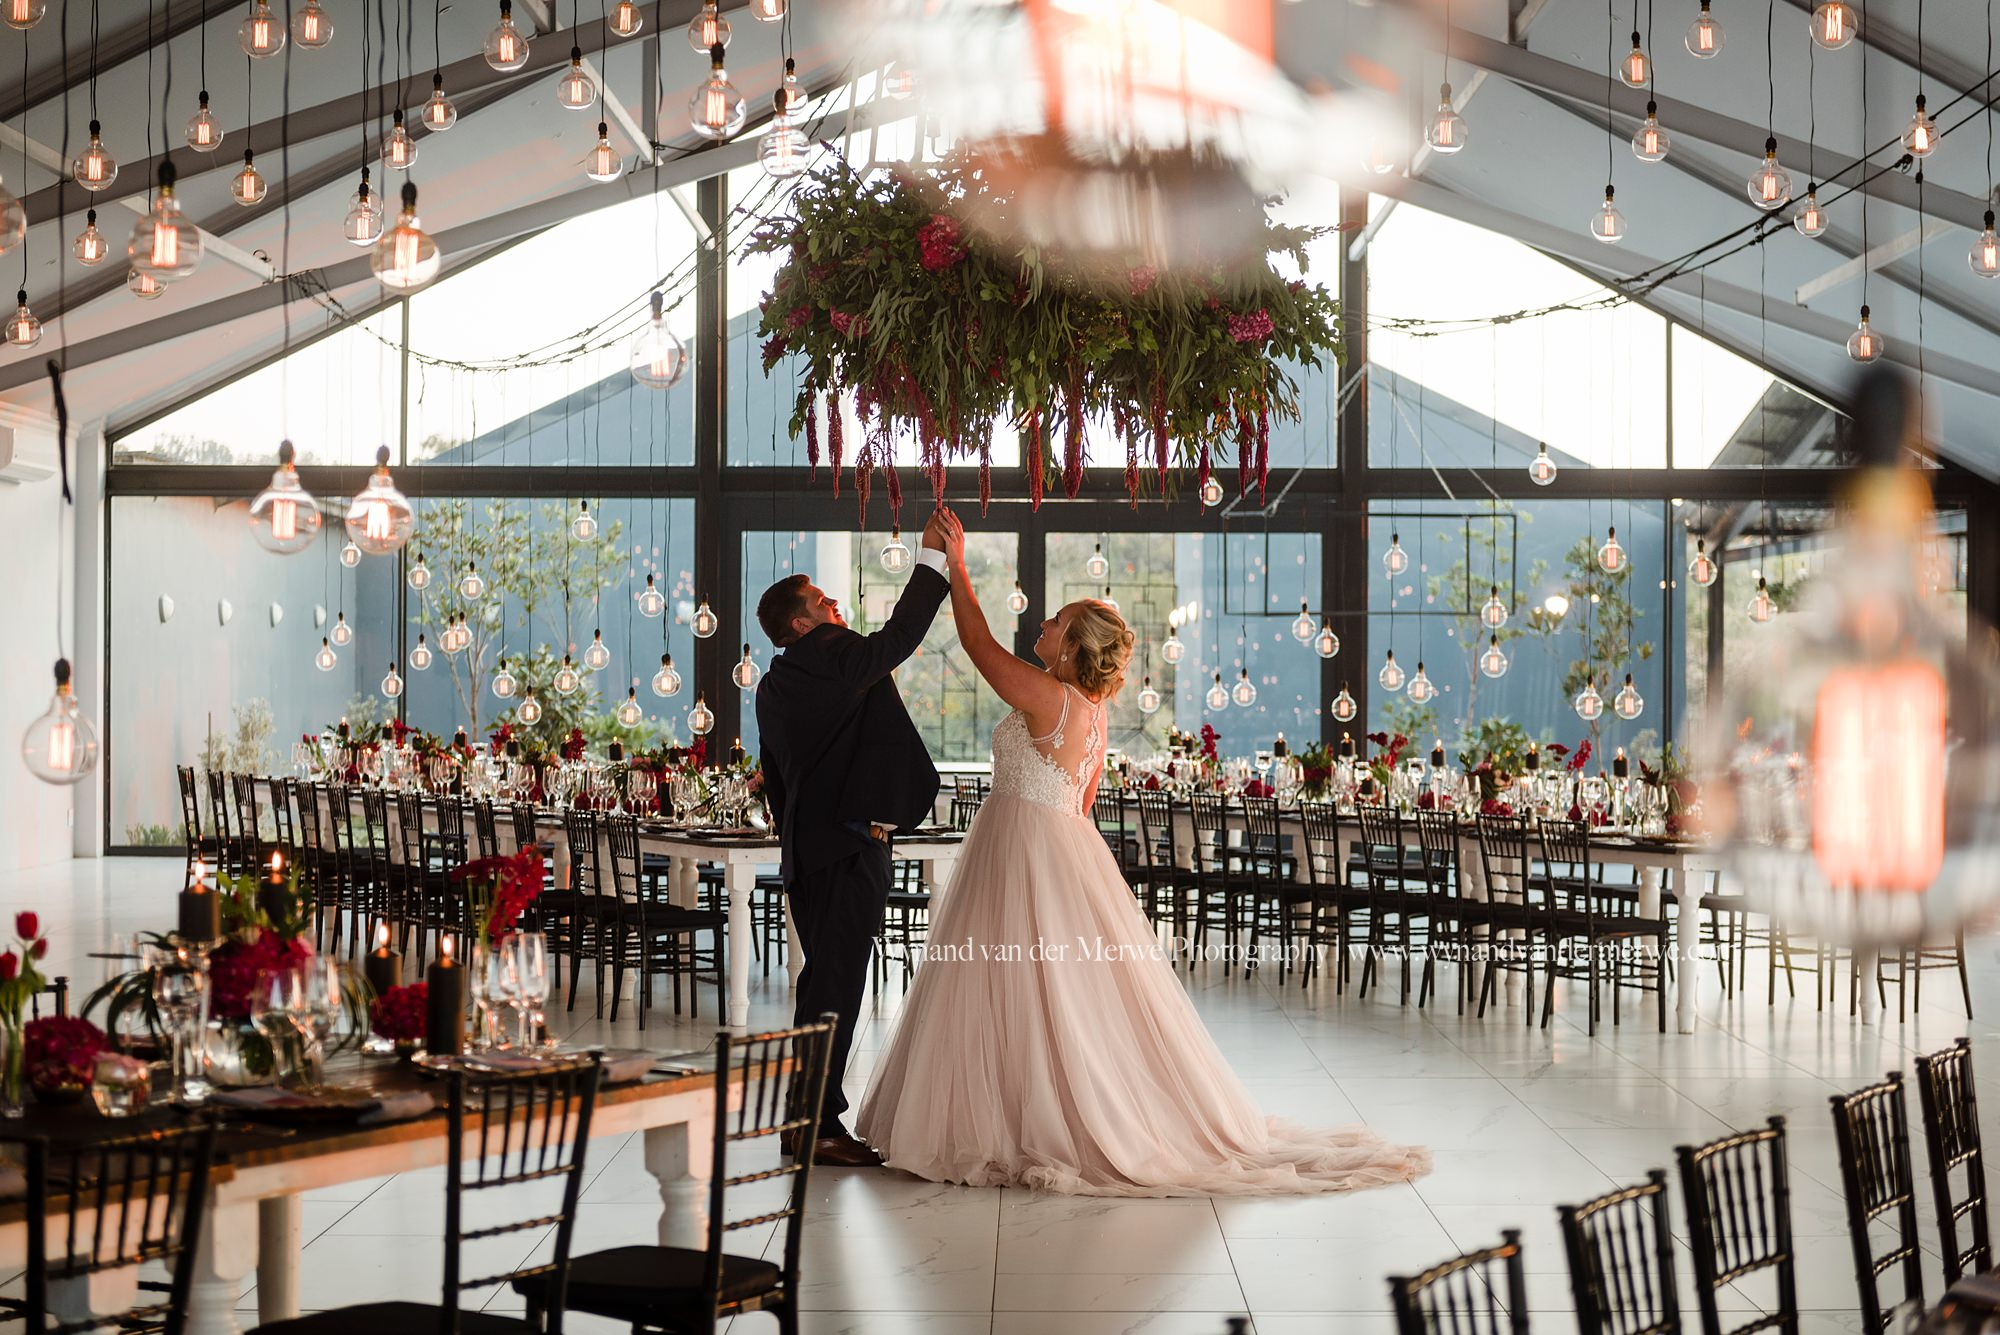 Wynandvandermerwe marcel zandrie wedding goregous inimitable wedding venue gauteng-33.jpg